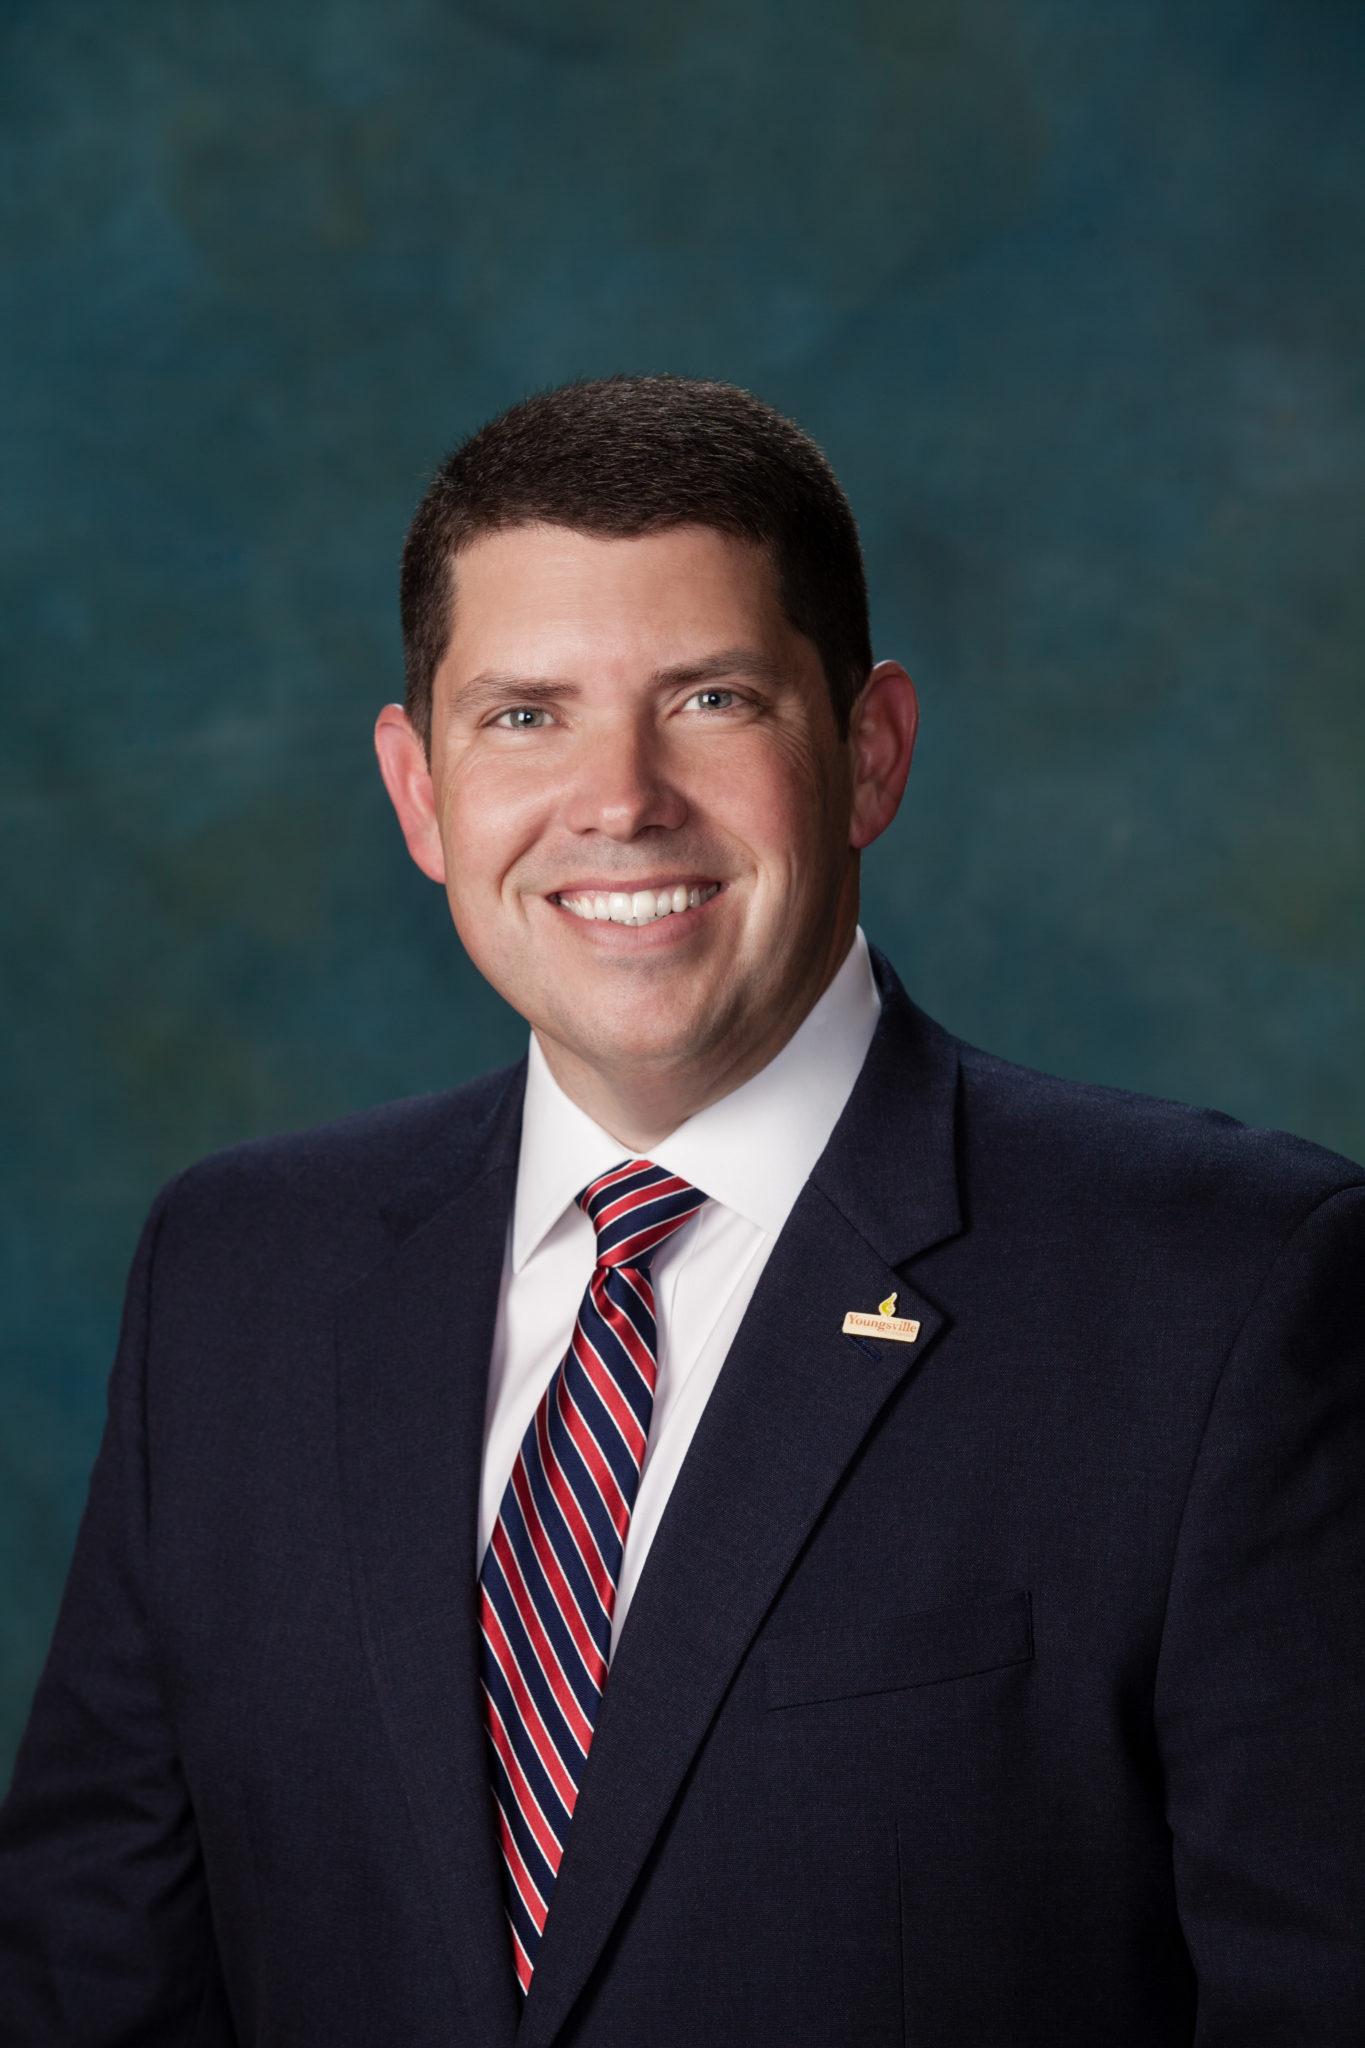 Matt Romero - Councilman